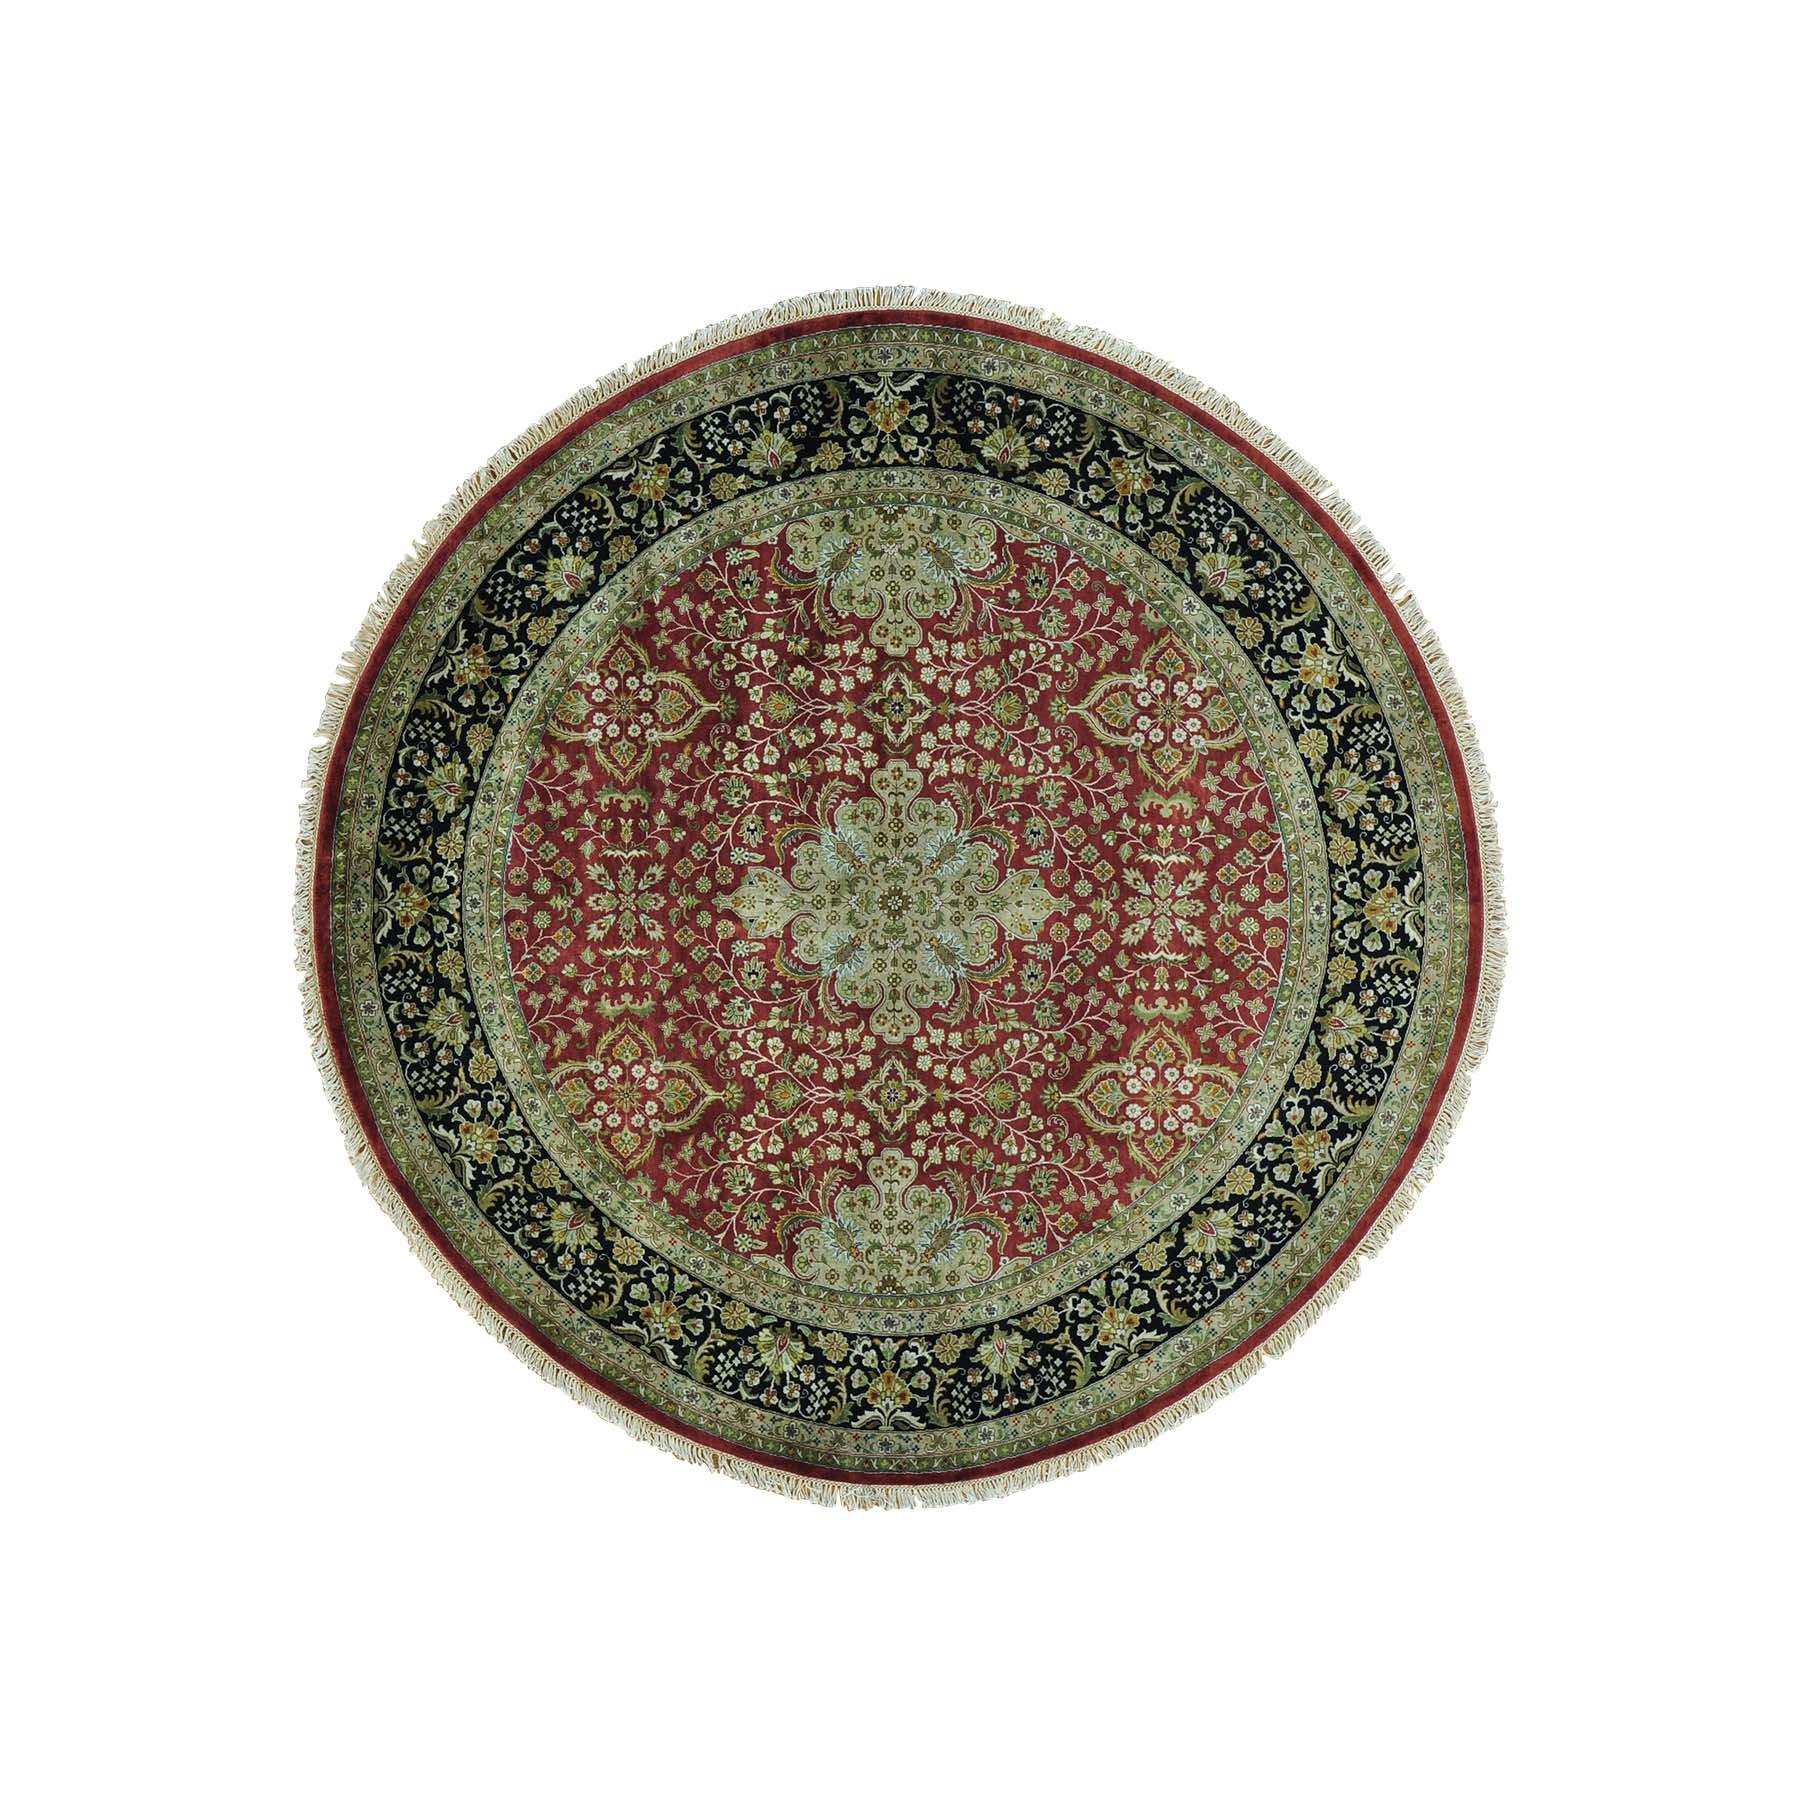 8'X8' New Zealand Wool Round Kashan Revival 300 Kpsi Oriental Rug moab8c6c